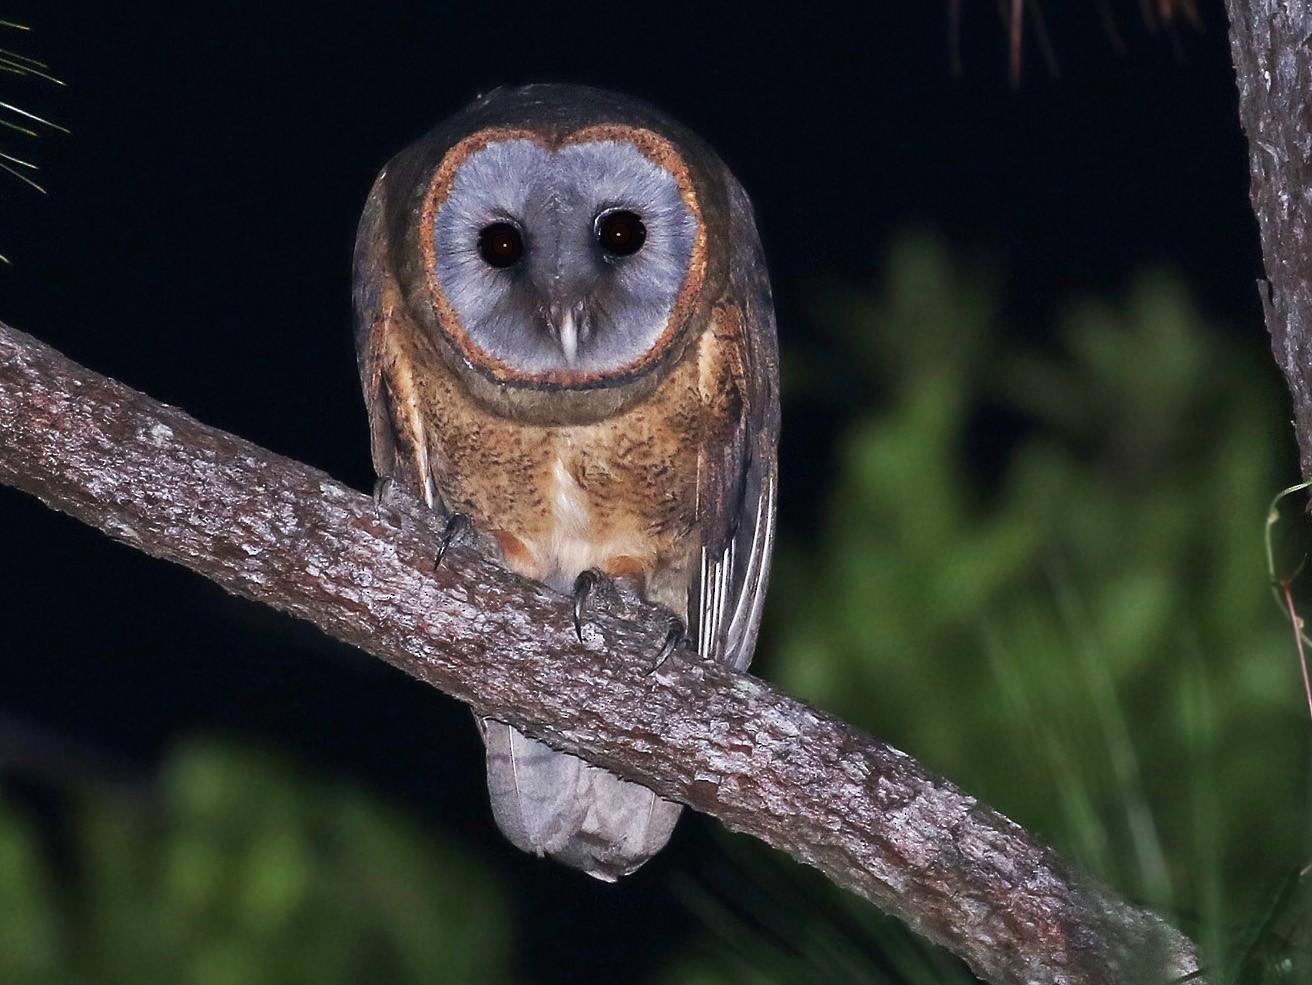 Ashy-faced Owl - Andrew Spencer